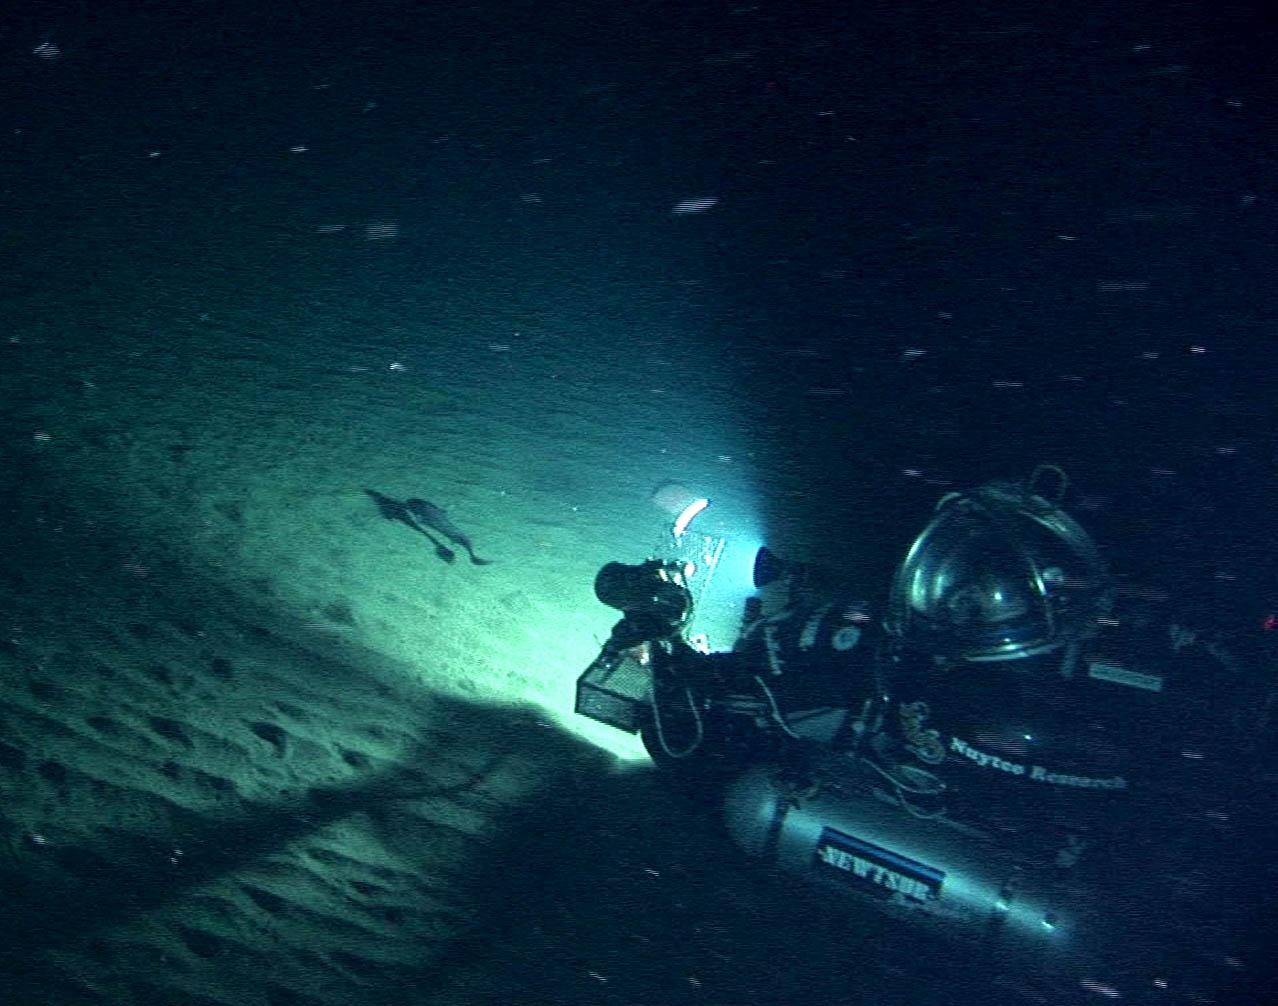 Dive-16-B010411-00045412-DeepWorker-6-filming-Giant-grenadier